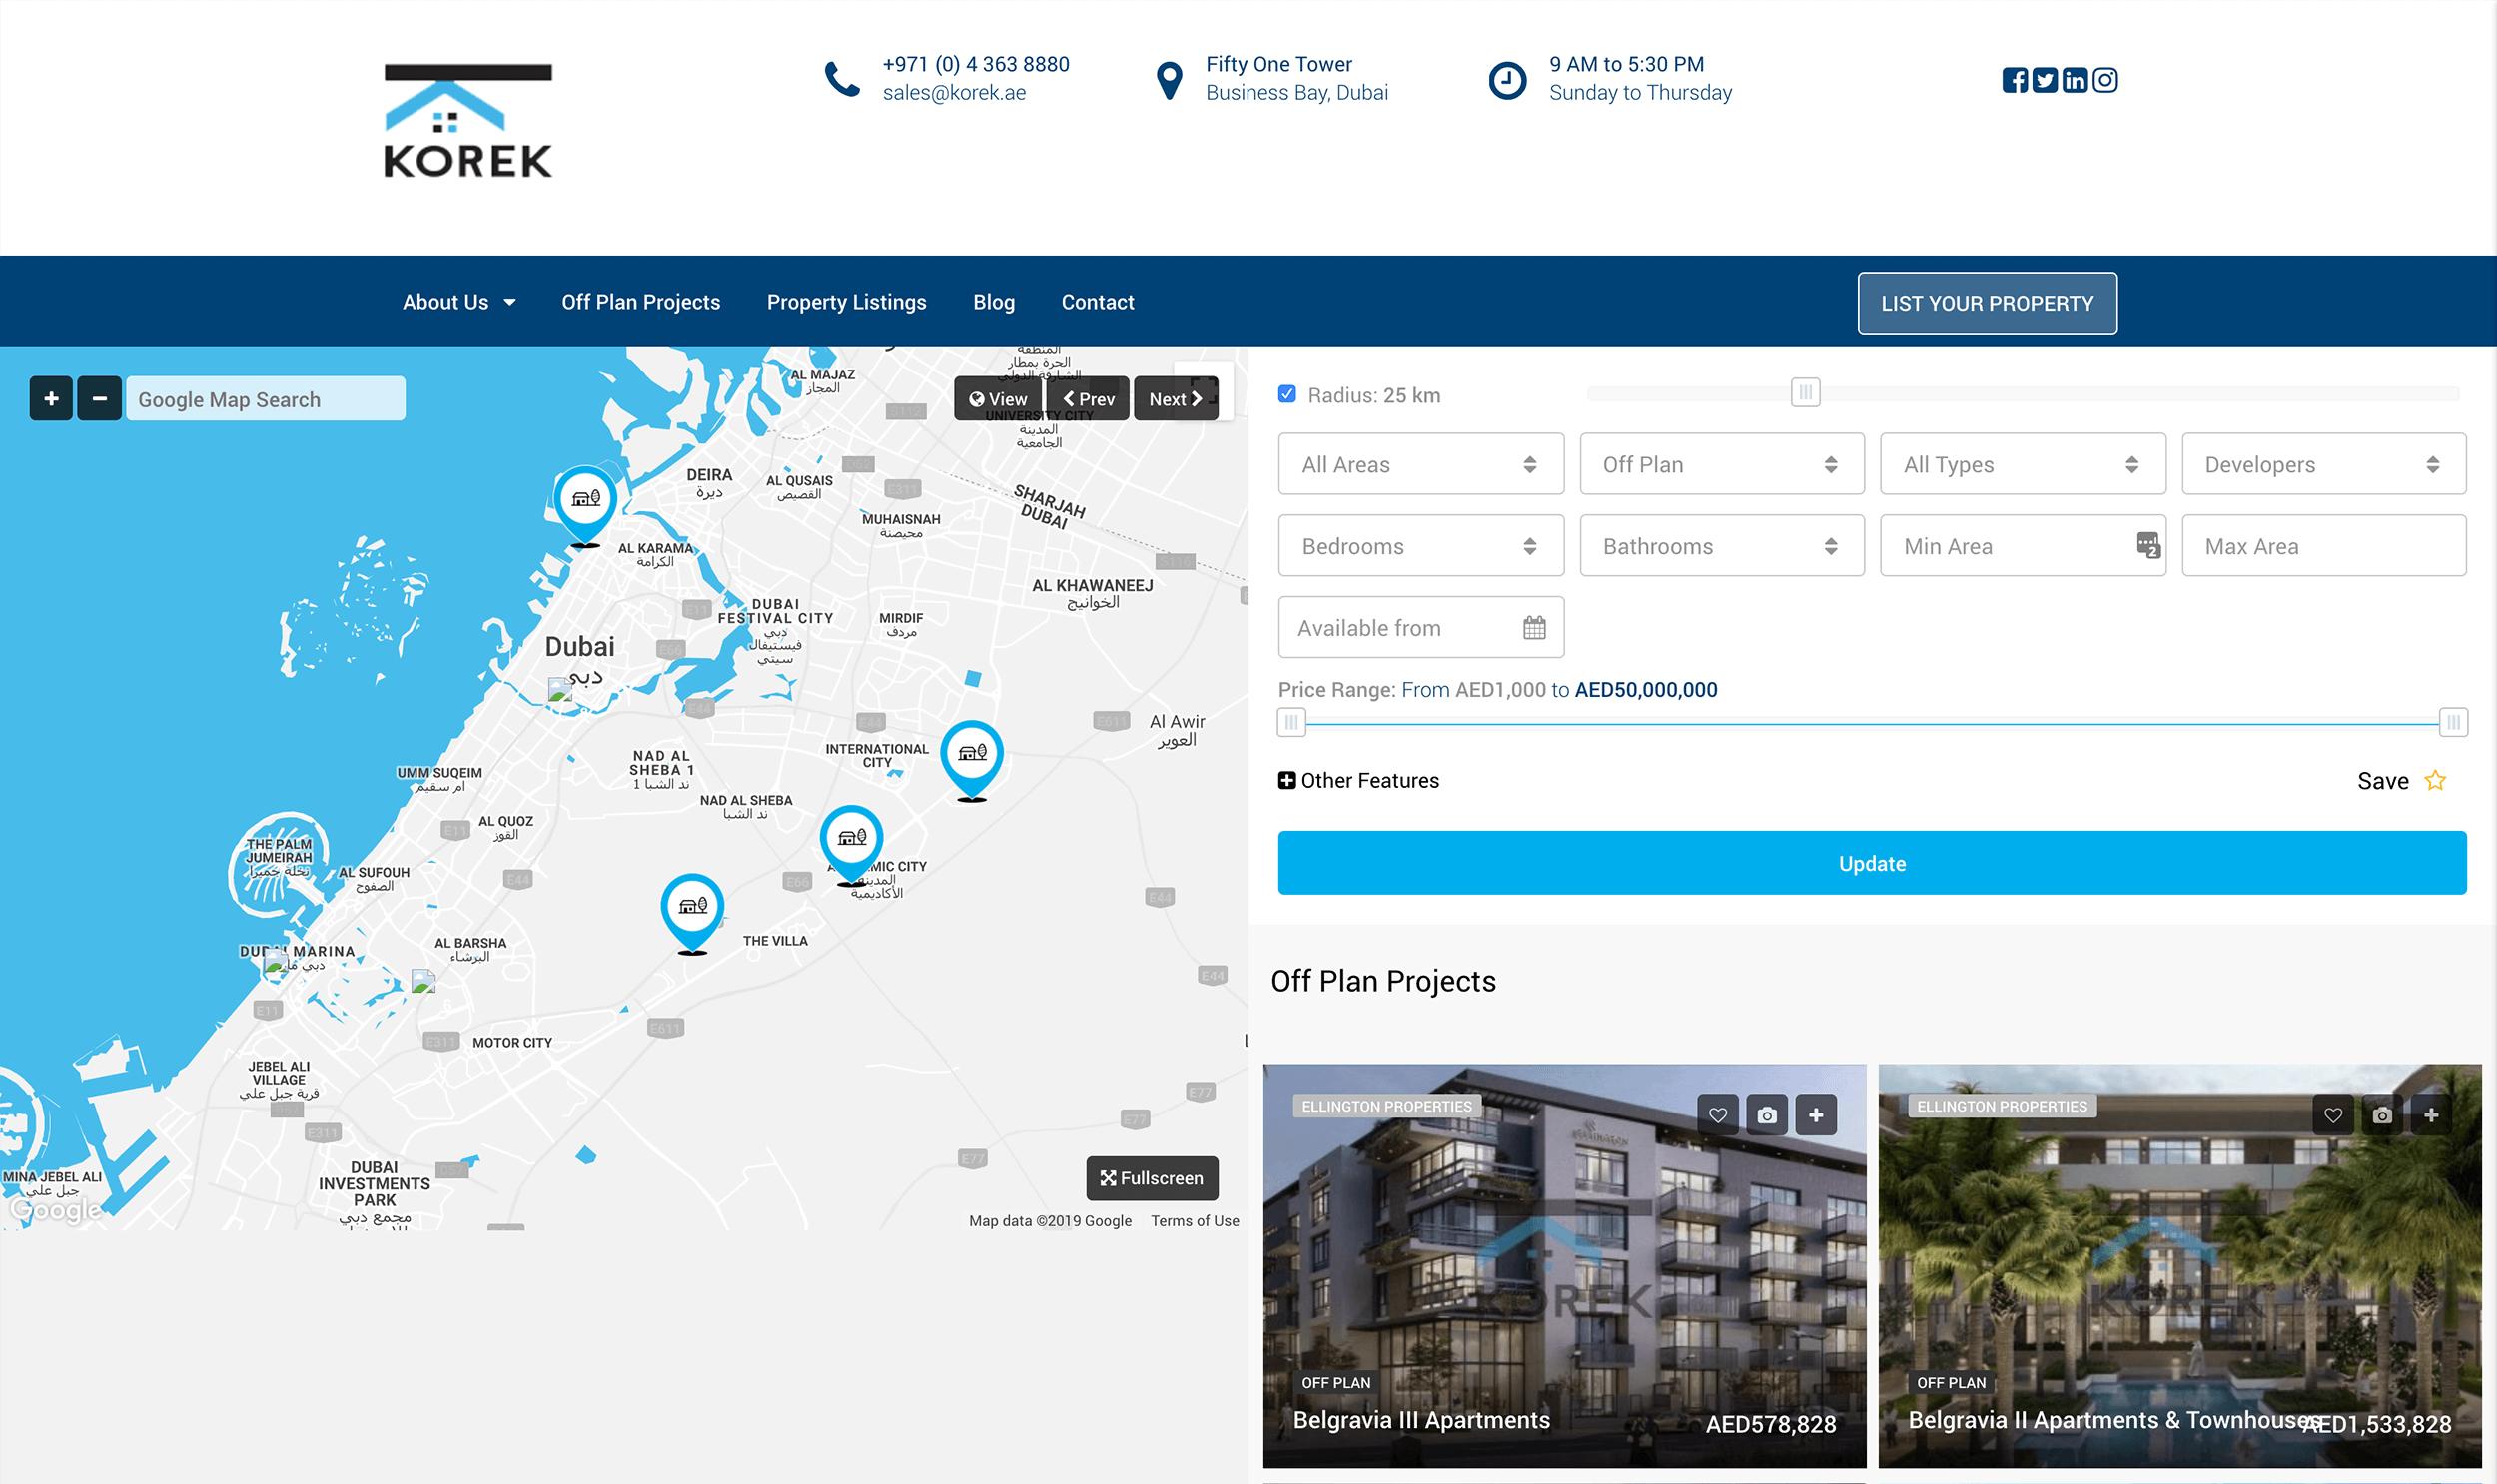 Korek Real Estate website